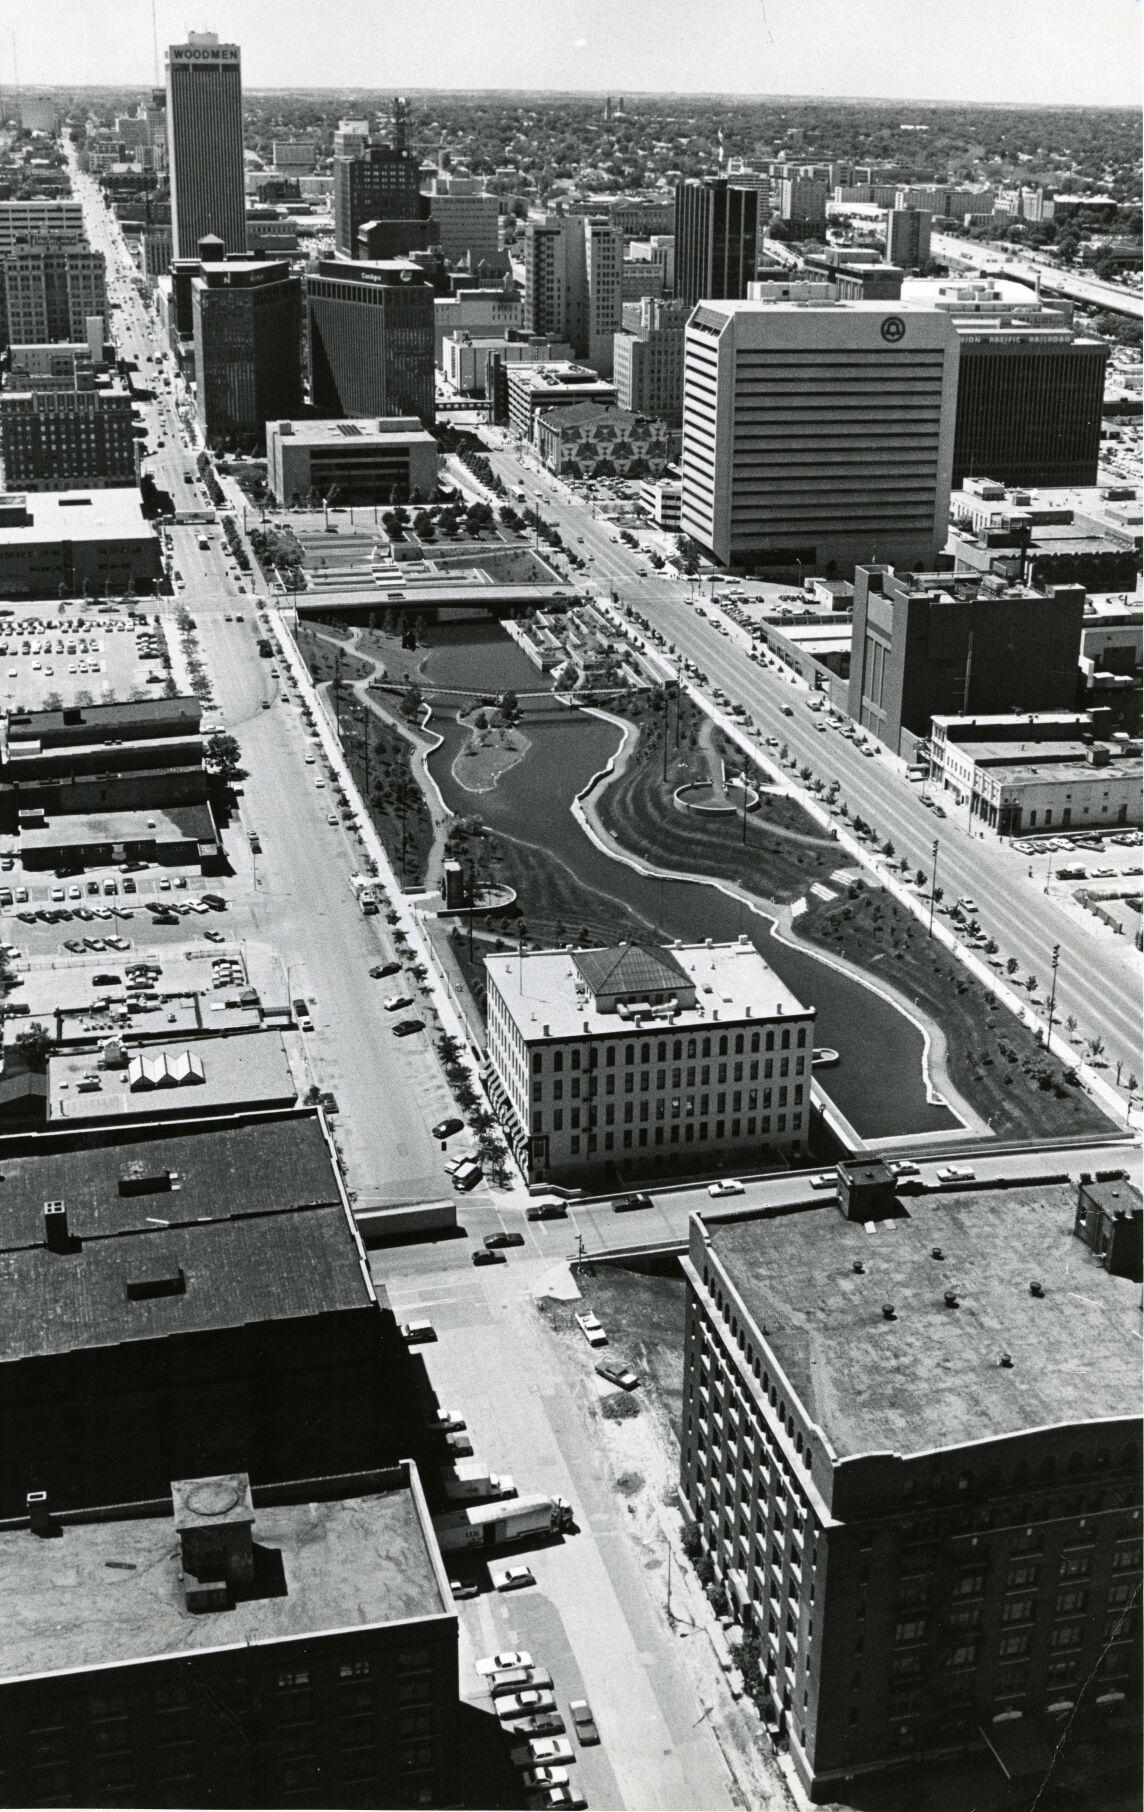 Main photo of downtown mall (web)